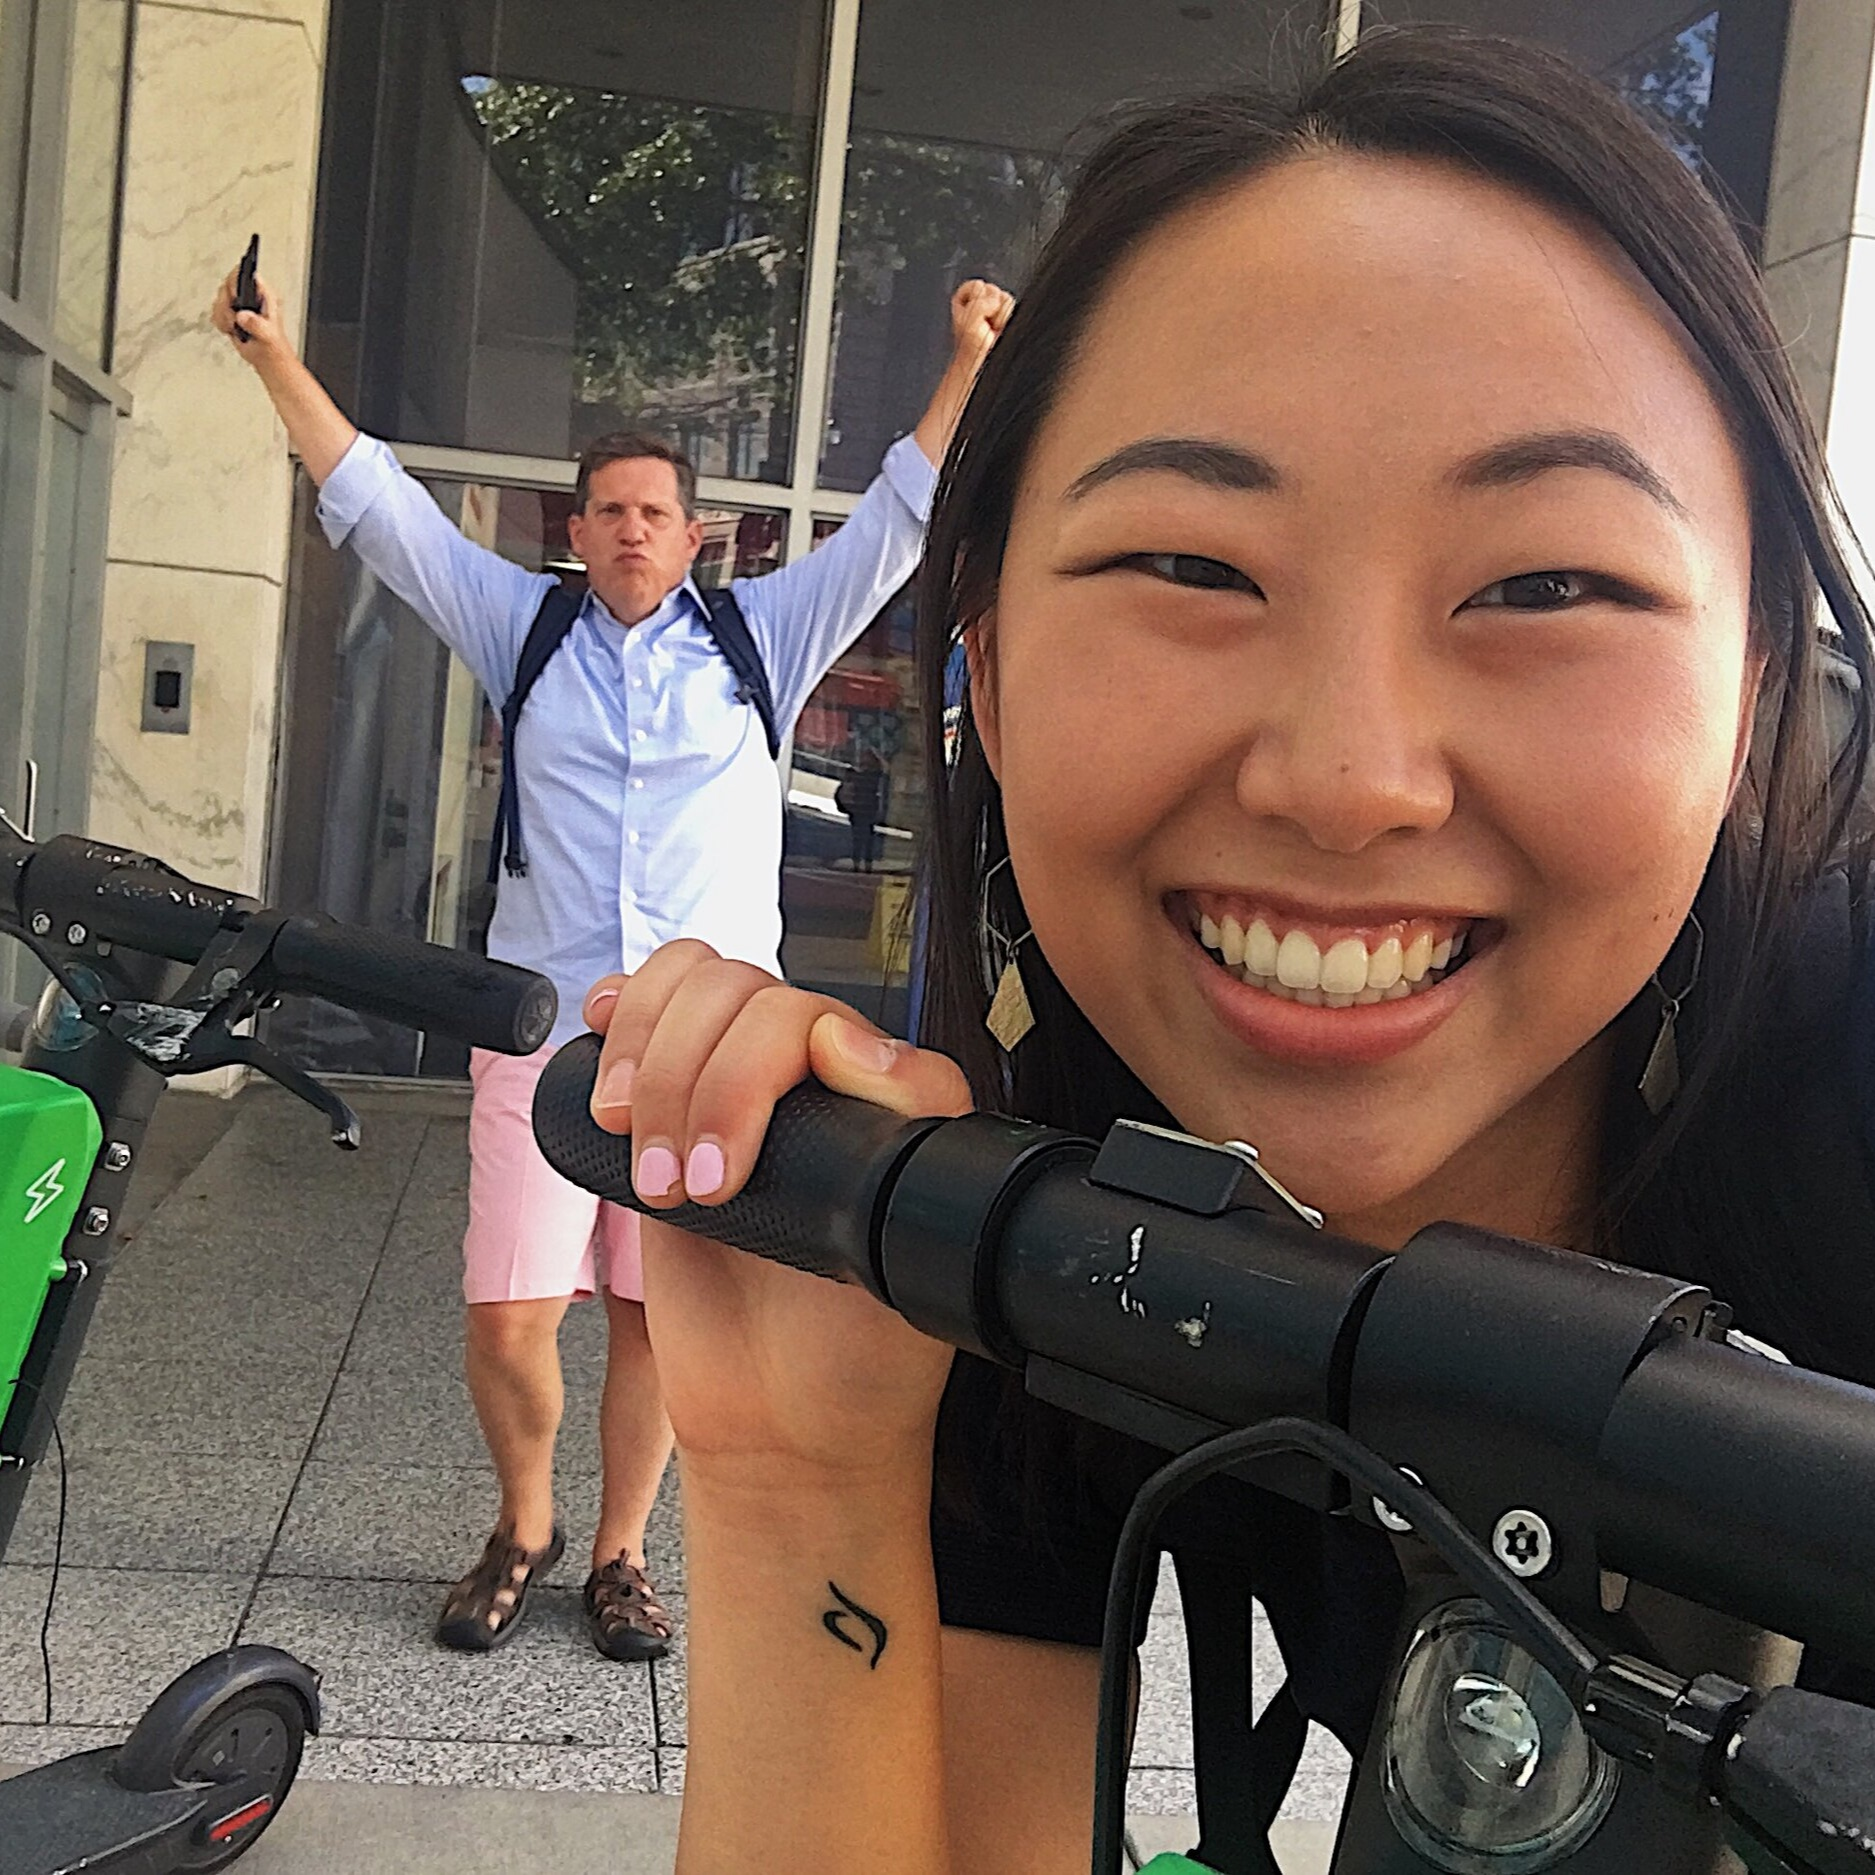 8_29_2019 Mich + Eric Scooter Adventure.JPG